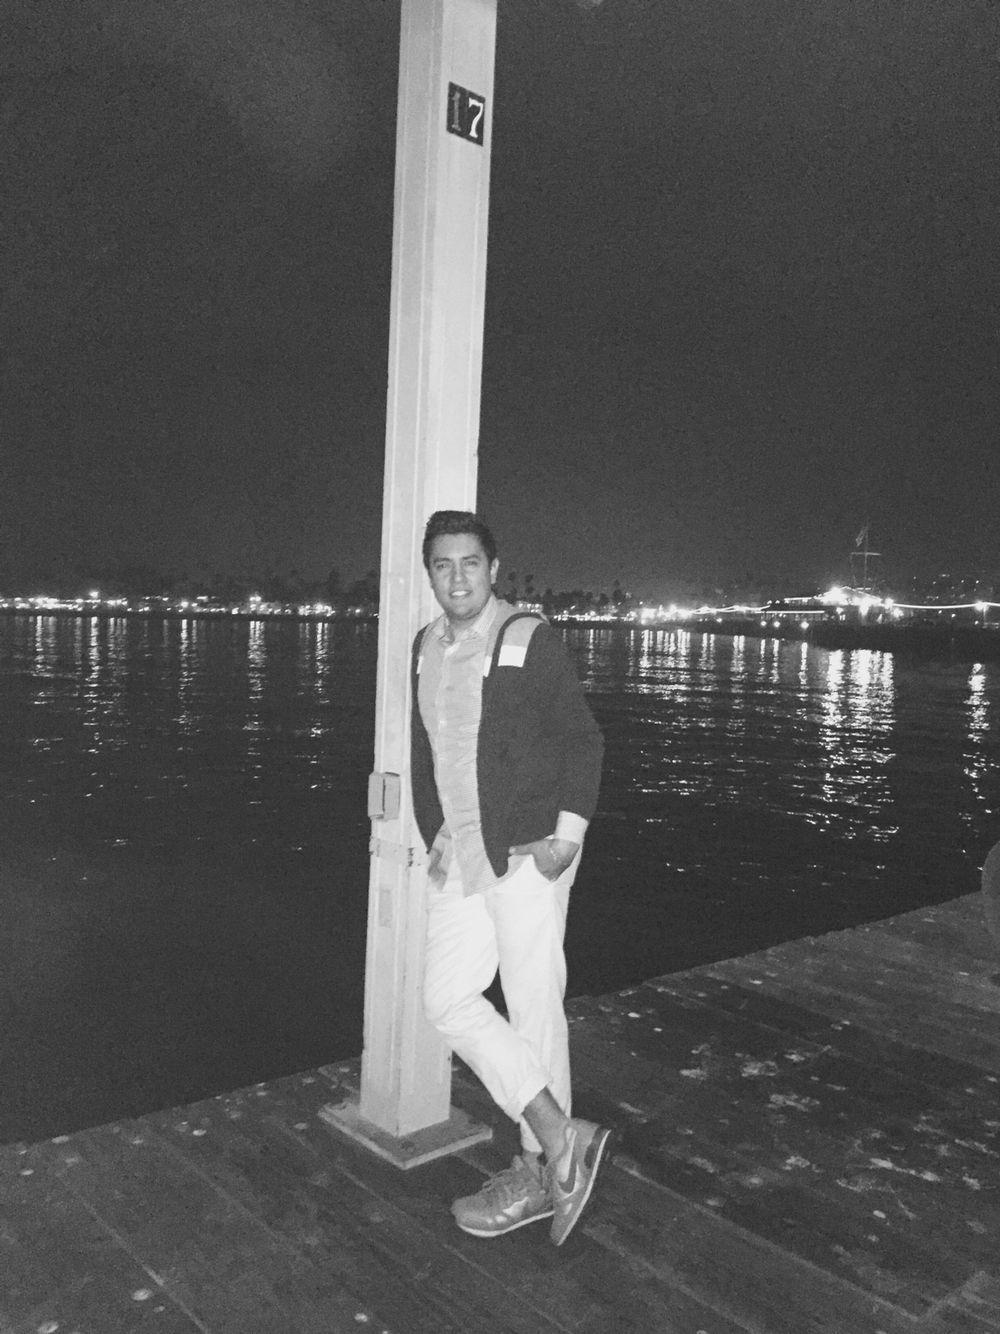 #followme#unit#italia#parís#mexico#mexican#lock#londo#gay#gayboy#chic#memostatigram#l4l#likes#love#men#Fashion#amsterdam#Japan#storyofmylife#together#happy#behappy#Spain#italia#LosÁngeles#Hollywood#Calabasas#santamonica#fermanparis @fermanparis